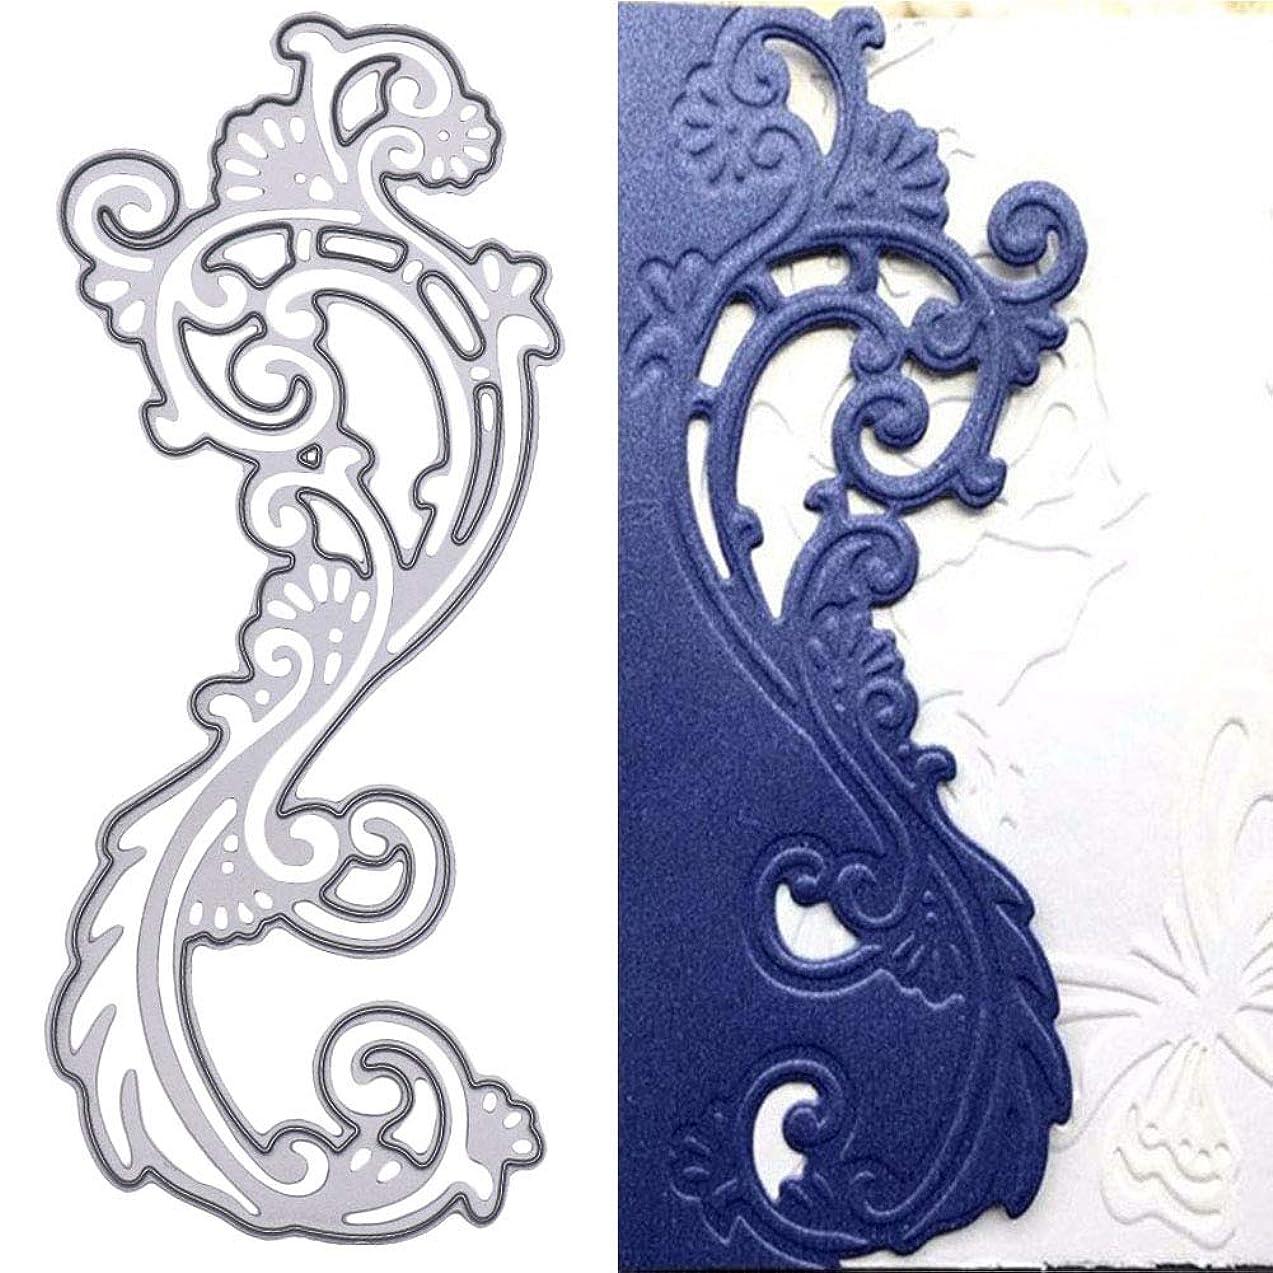 MAMUNU Die Cuts Lace Flower Metal Cutting Die Craft Die for Scrapbooking Card Making (Lace Flower)